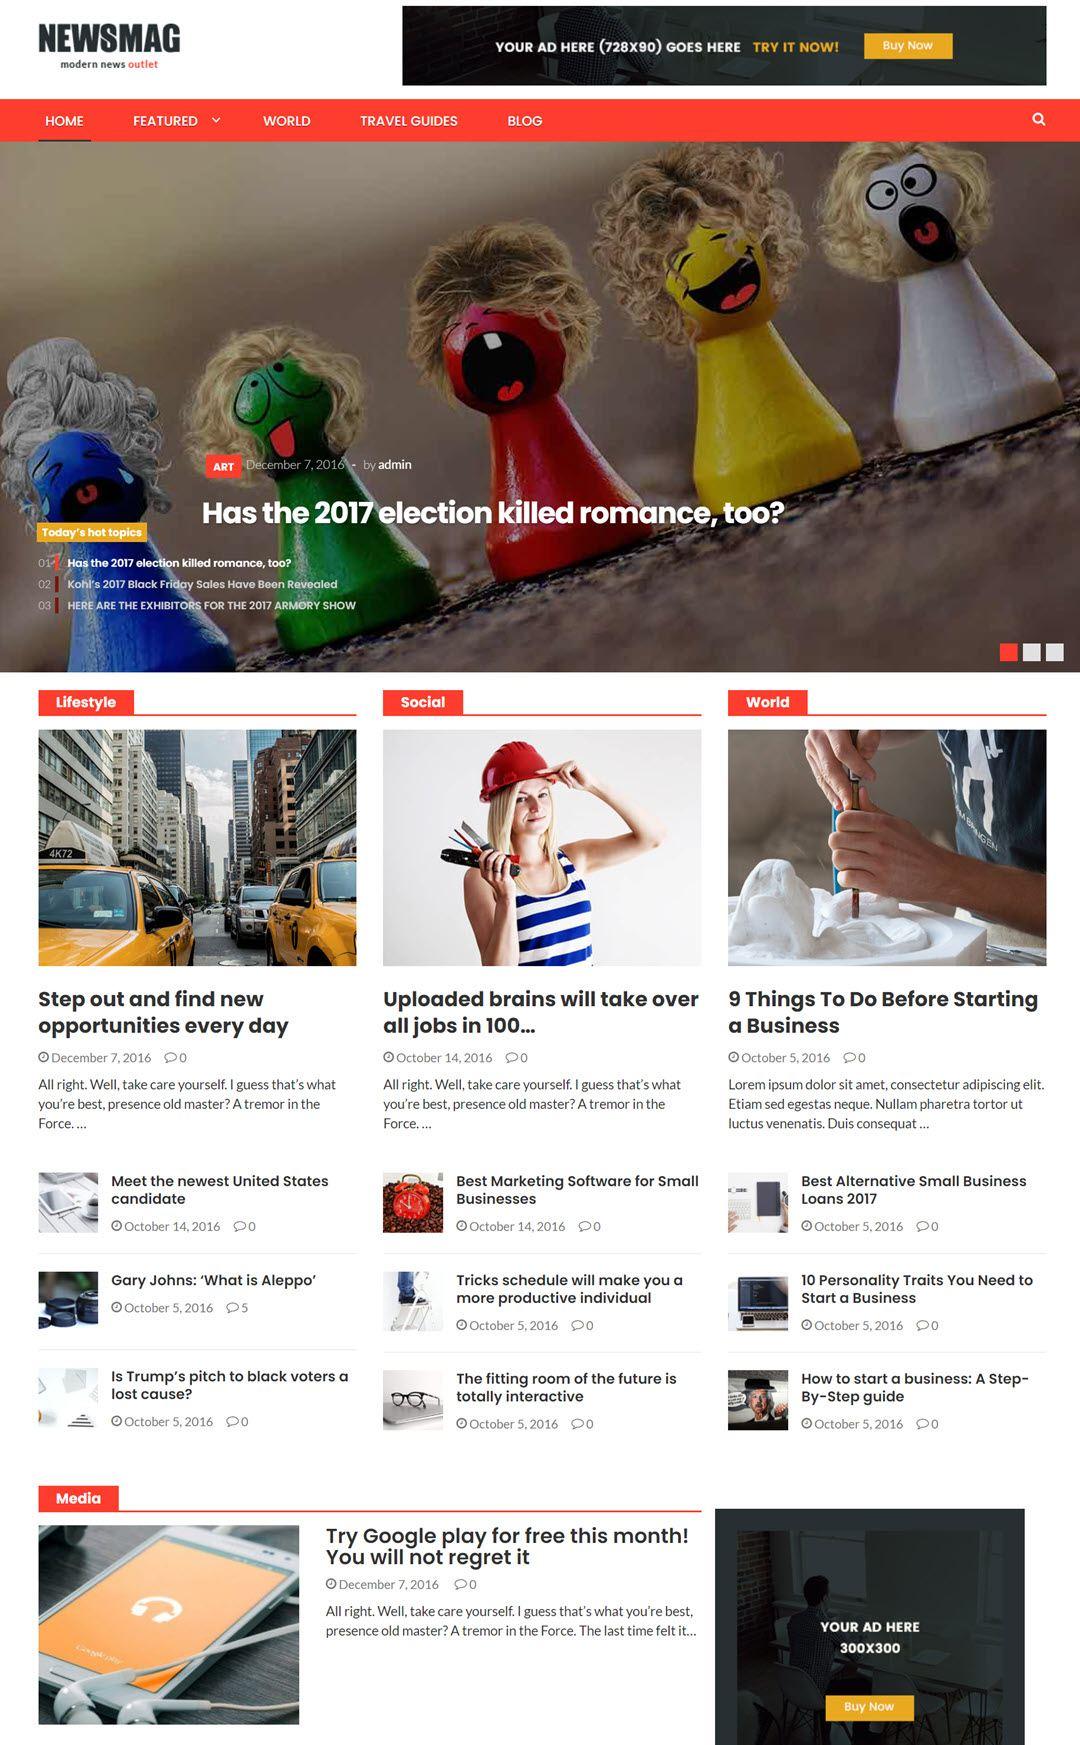 NewsMag Theme For WordPress Screenshot